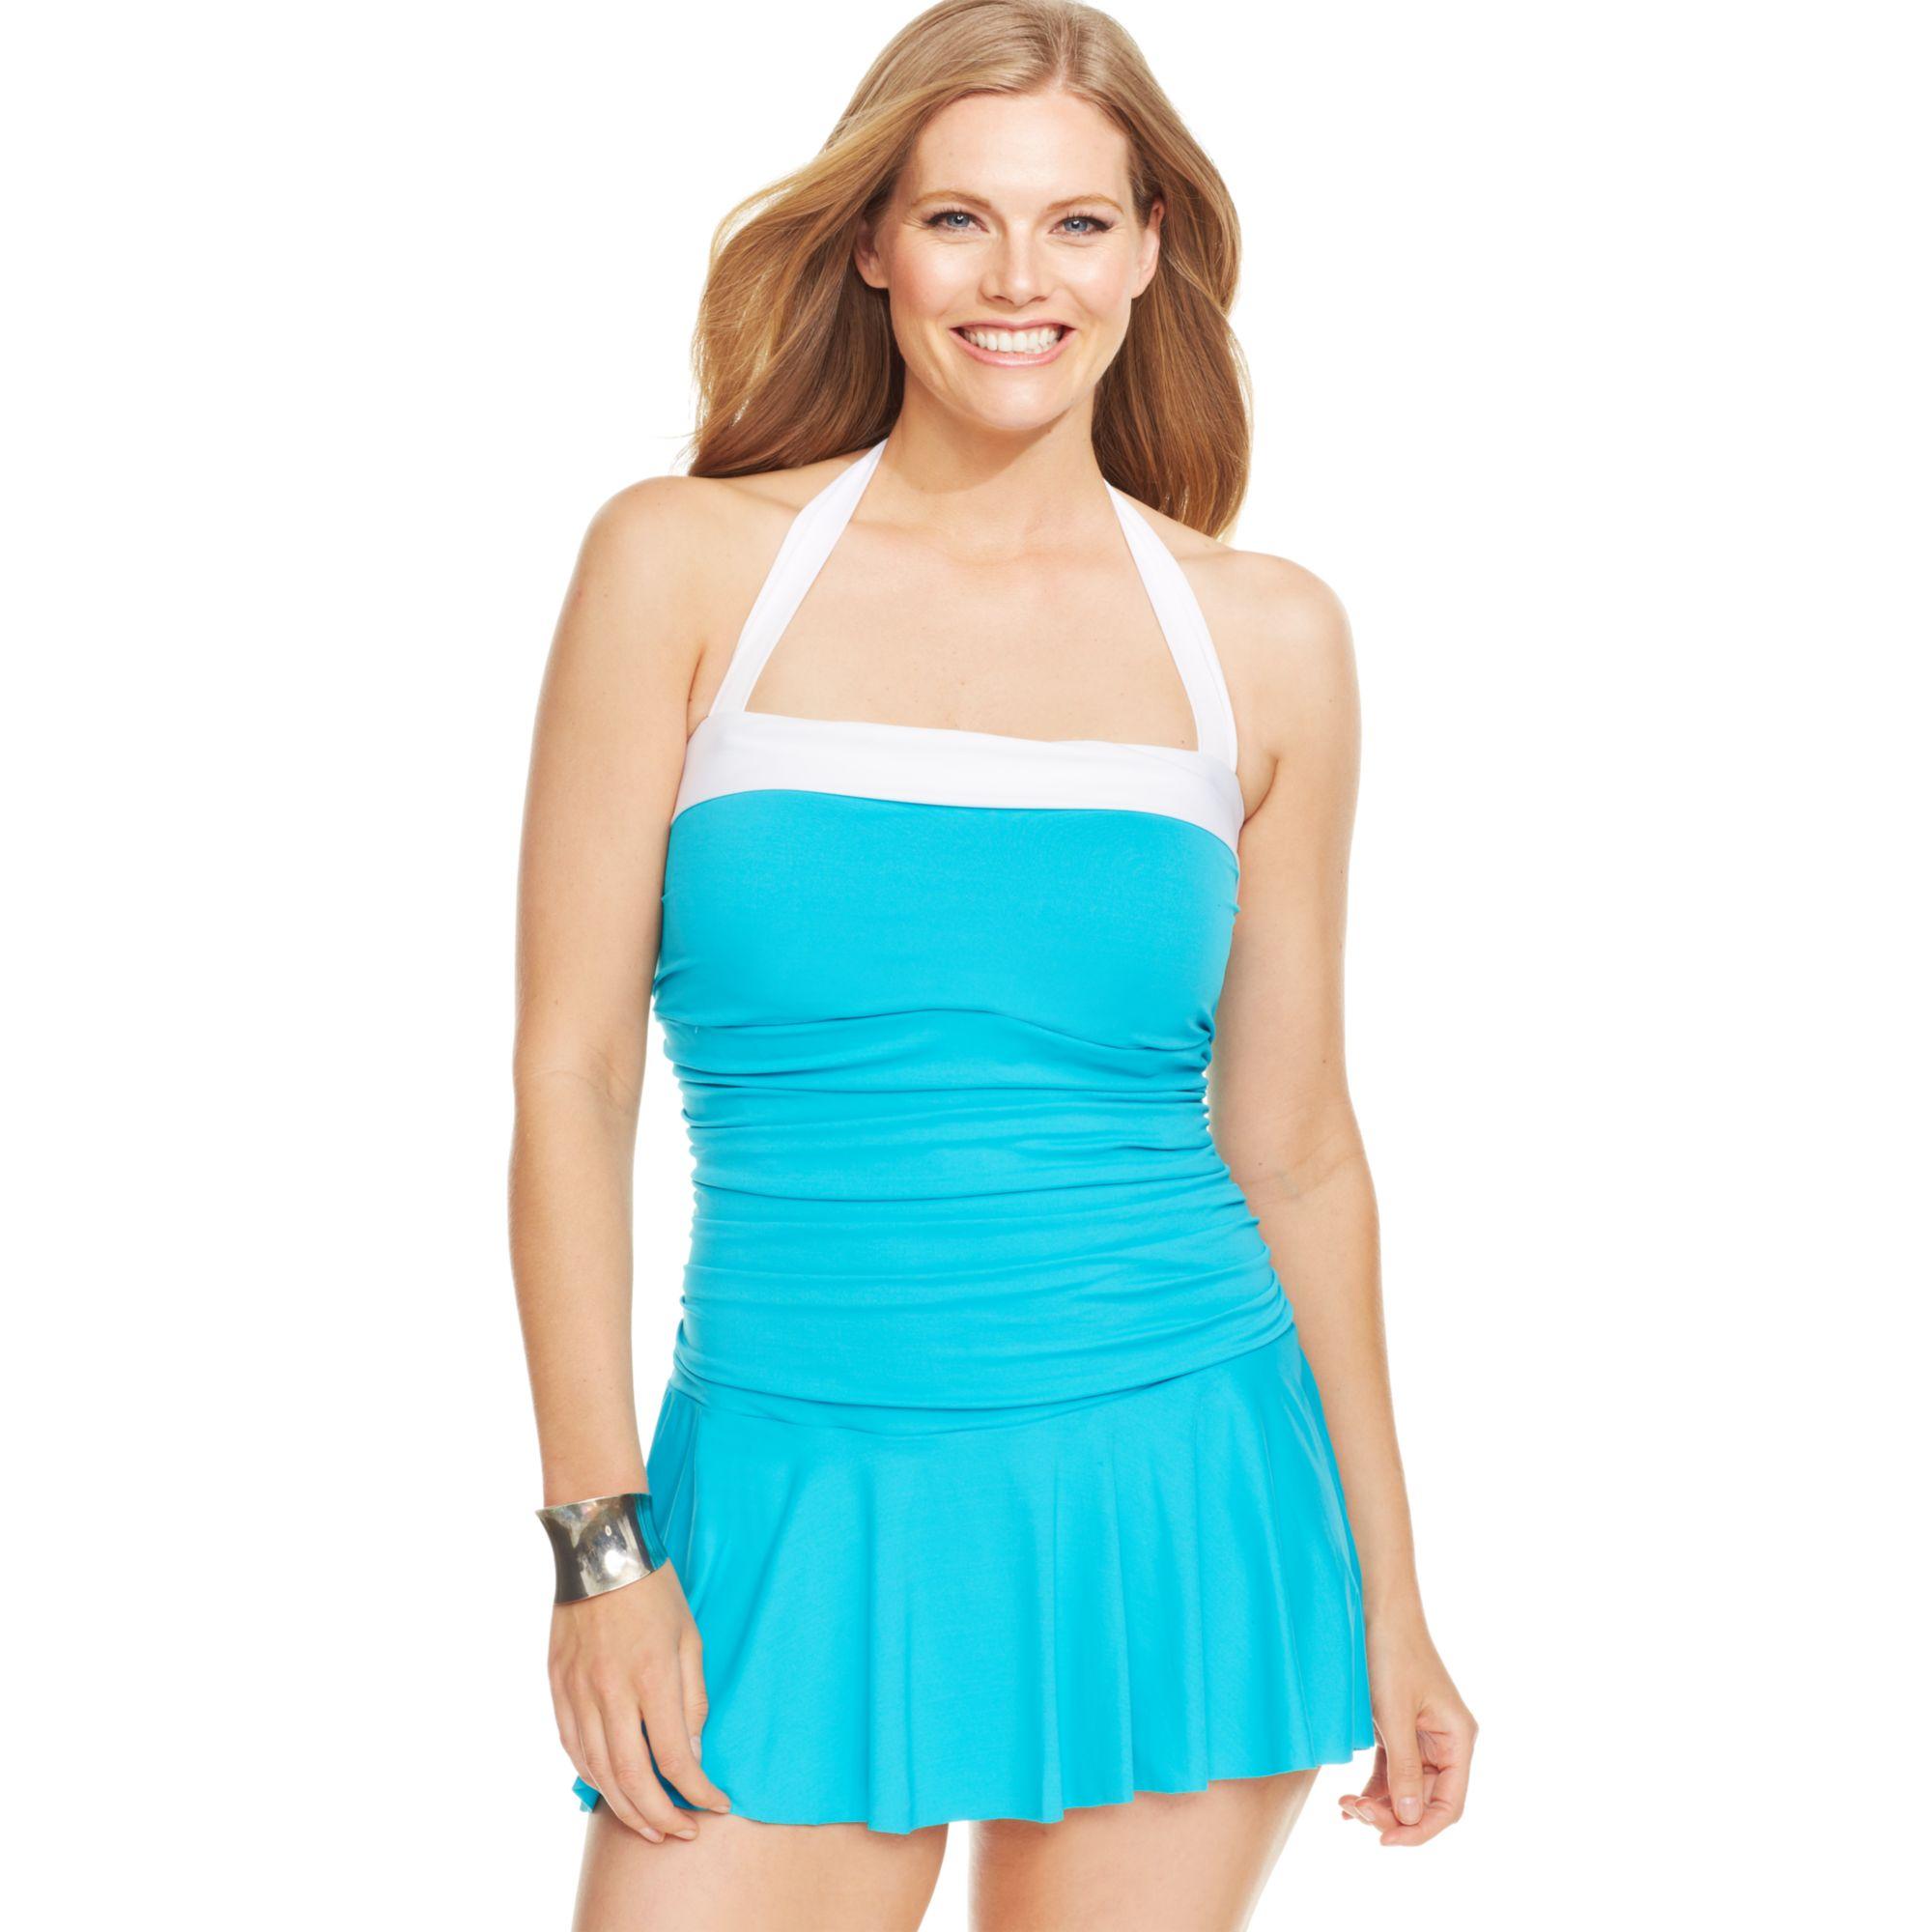 a08487cba7c99 Lyst - Lauren by Ralph Lauren Plus Size Colorblocked Halter ...